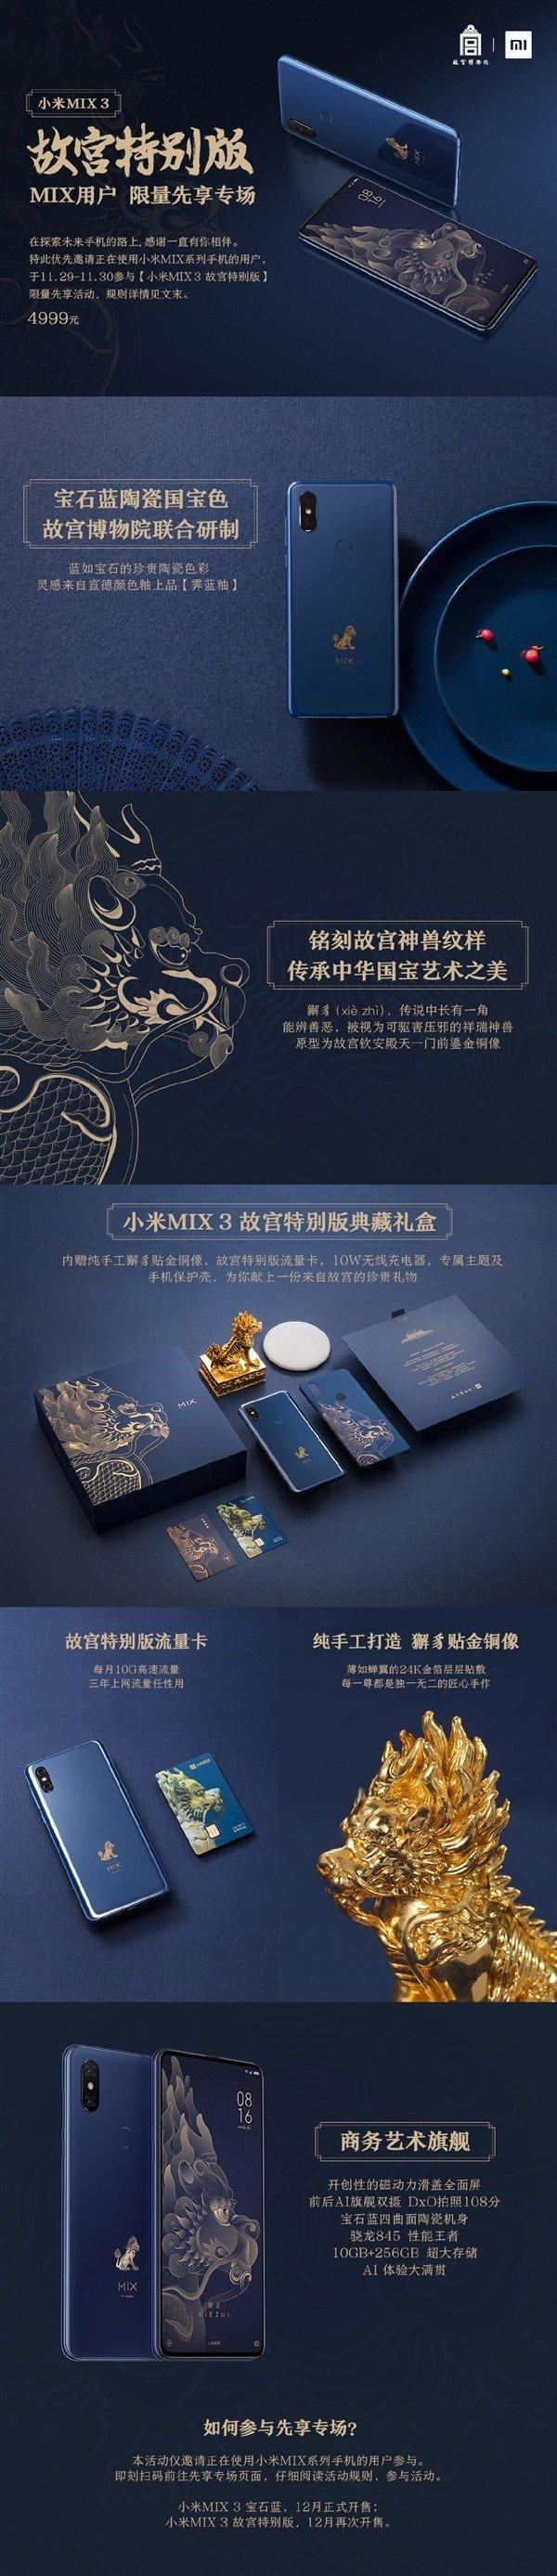 小米MIX 3,小米MIX 3配置,小米MIX 3售价